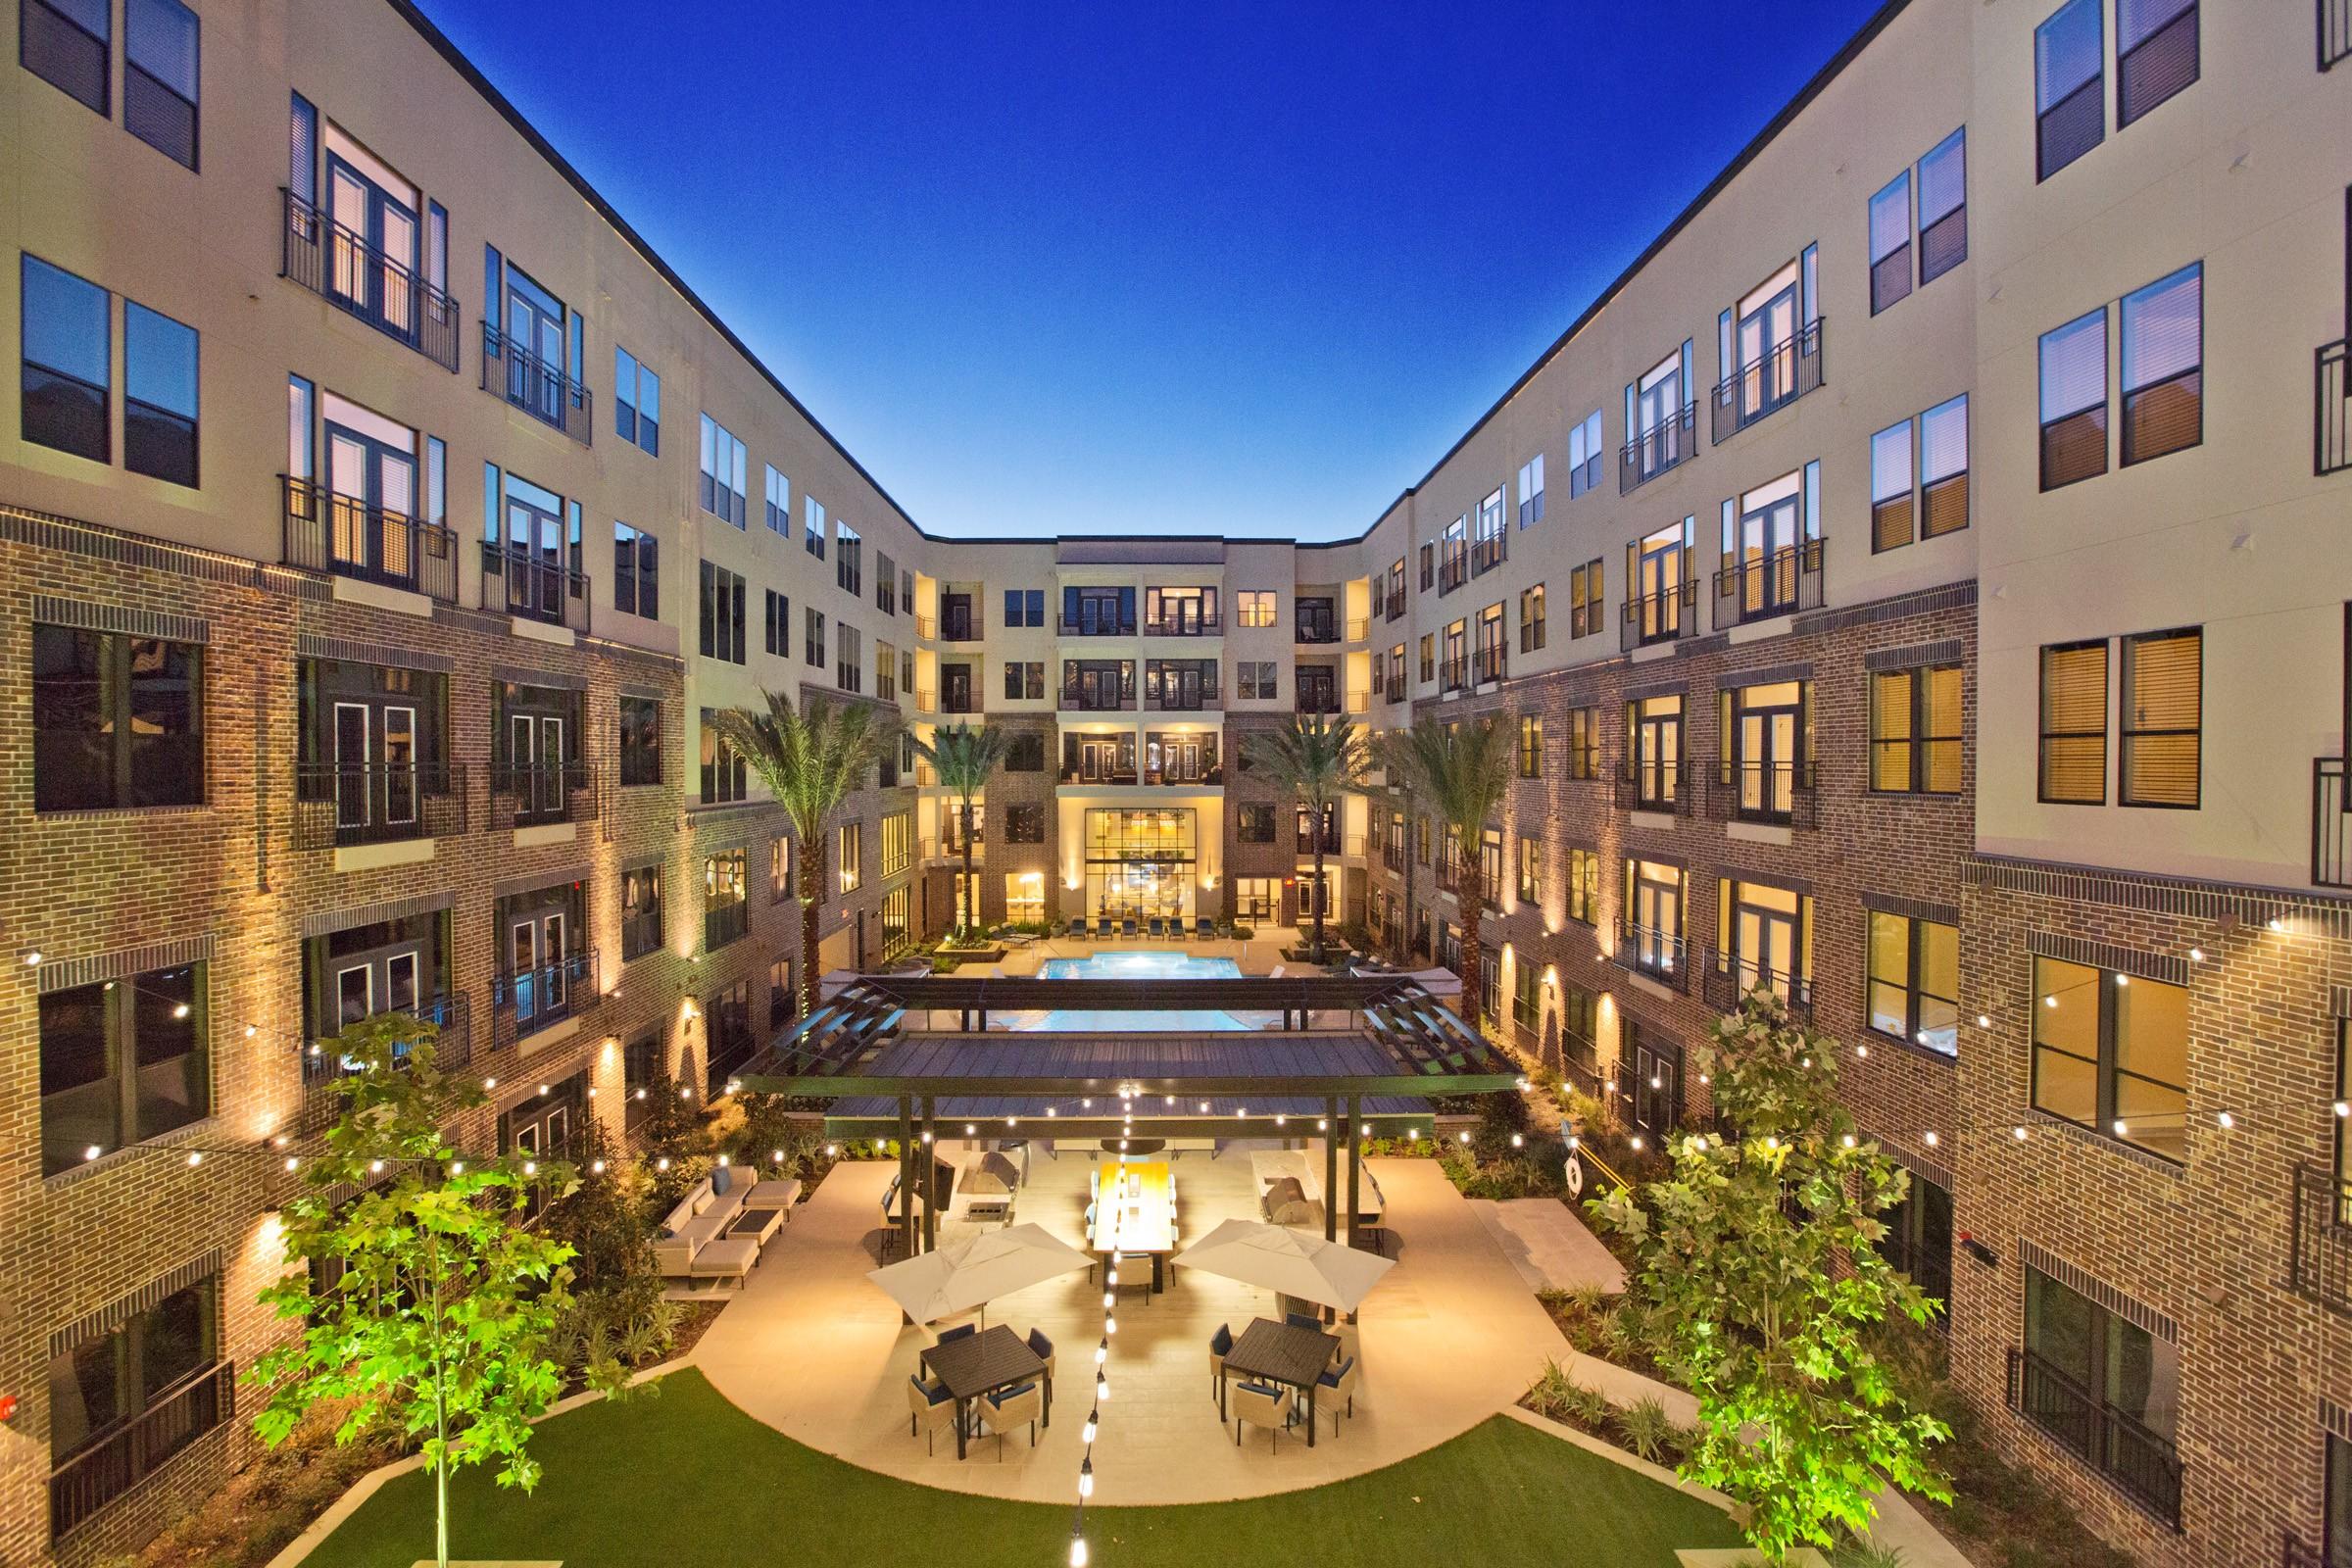 9 Houses & Apartments near Stratford High School Houston